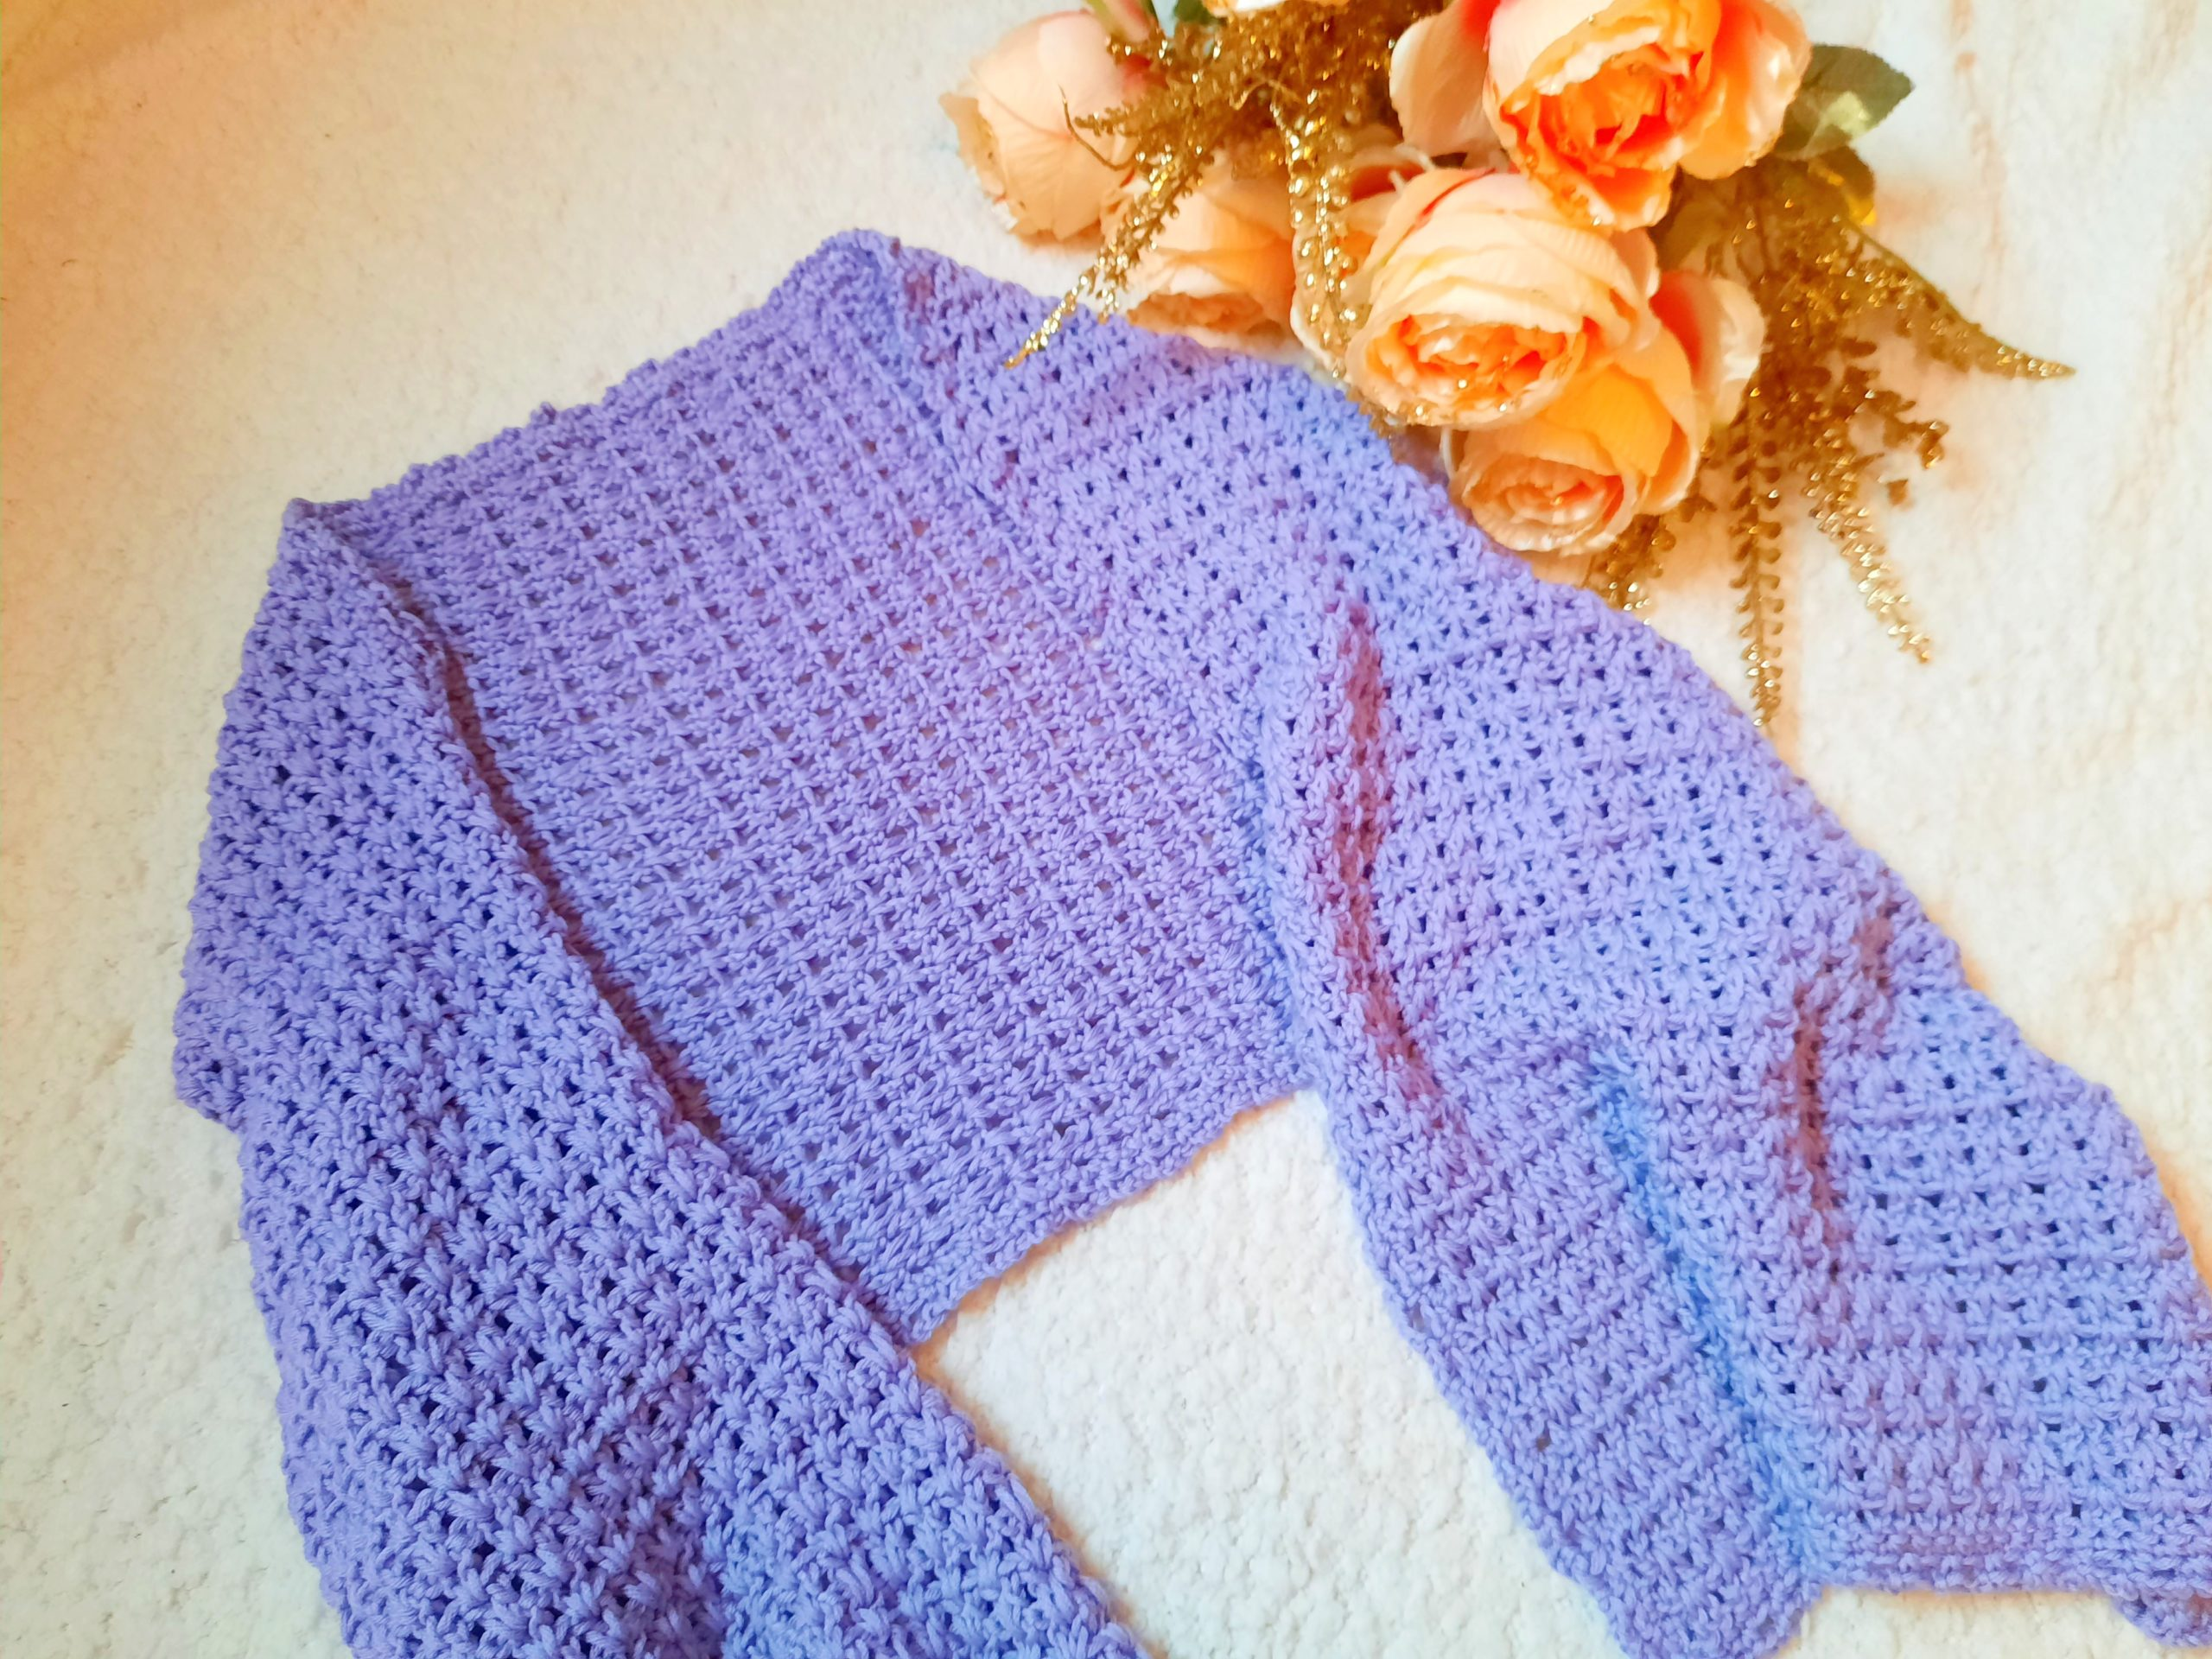 Crochet The Sweet Lilac Edwardian Era Wrap